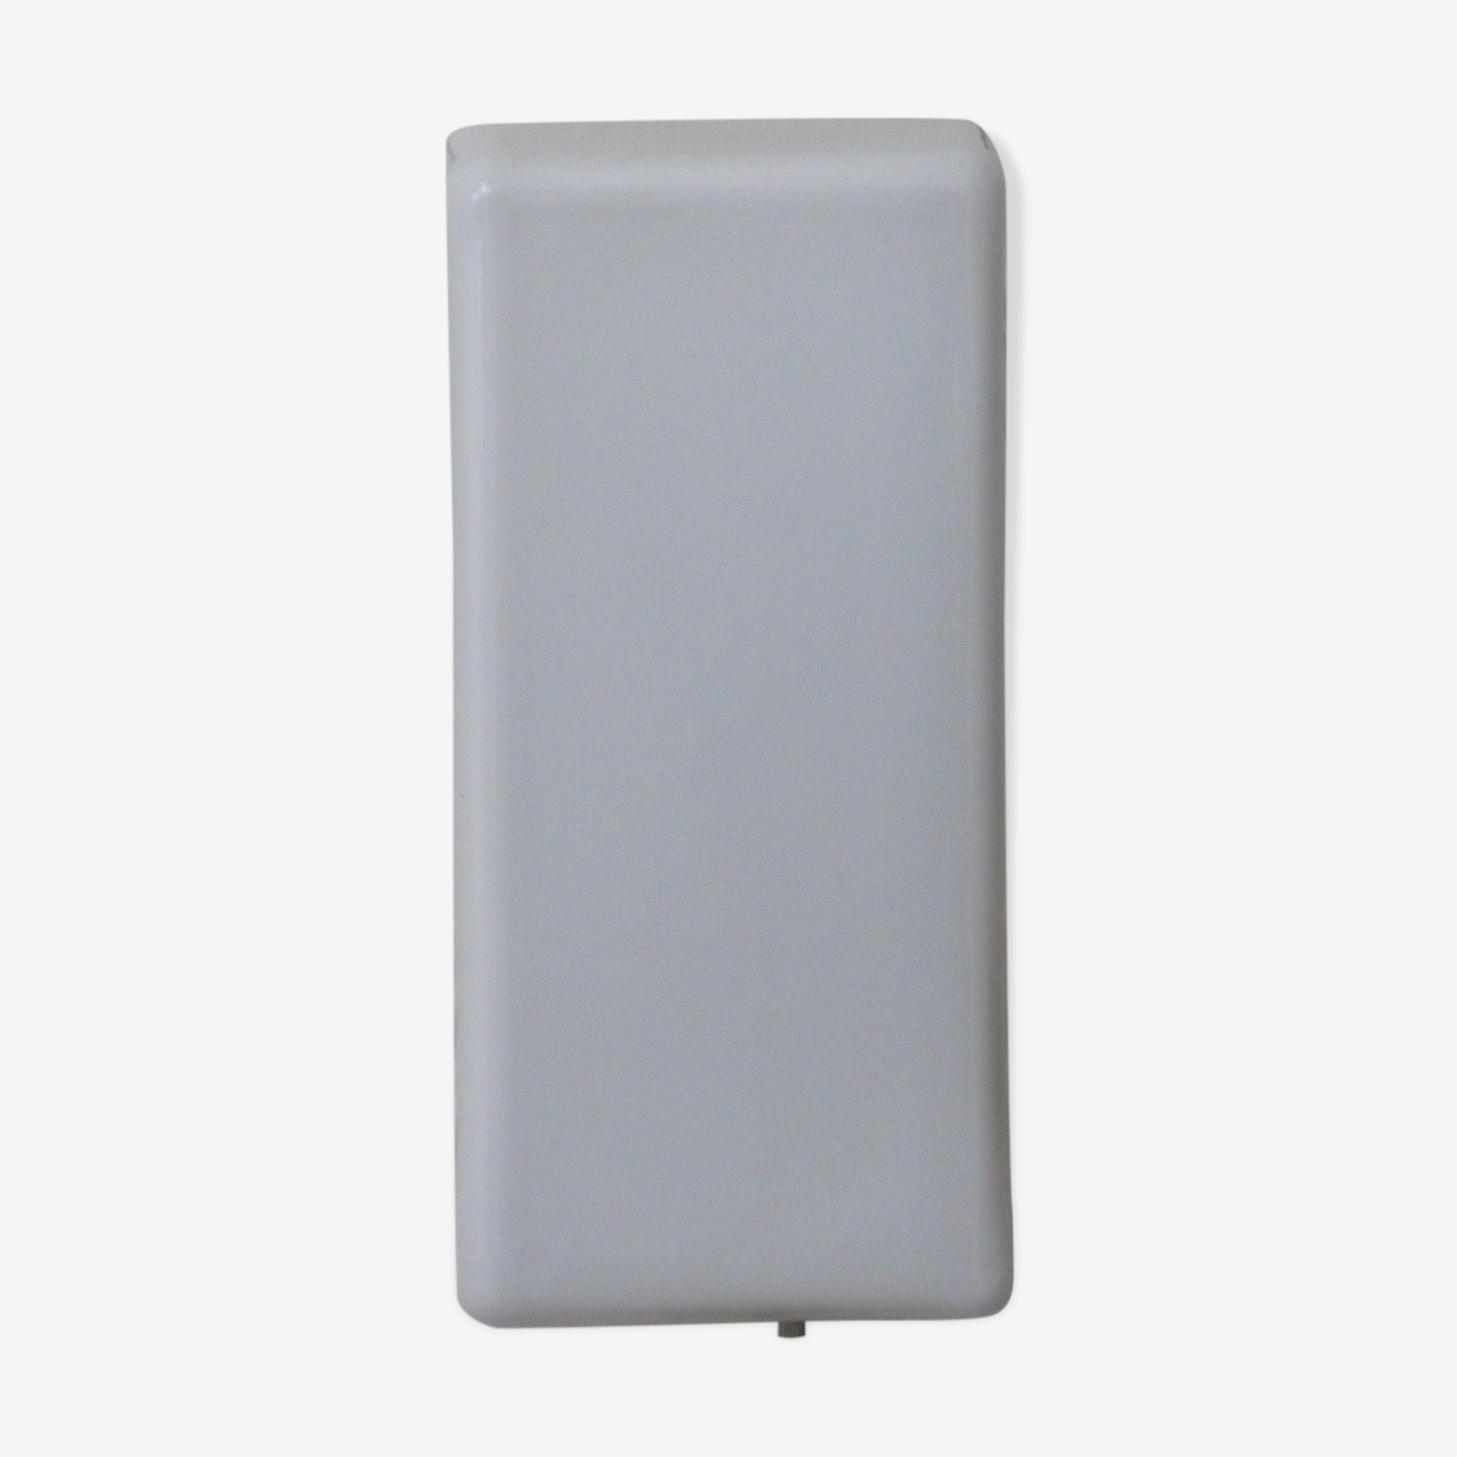 Applique plafonnier verre opaline blanche brillante rectangulaire